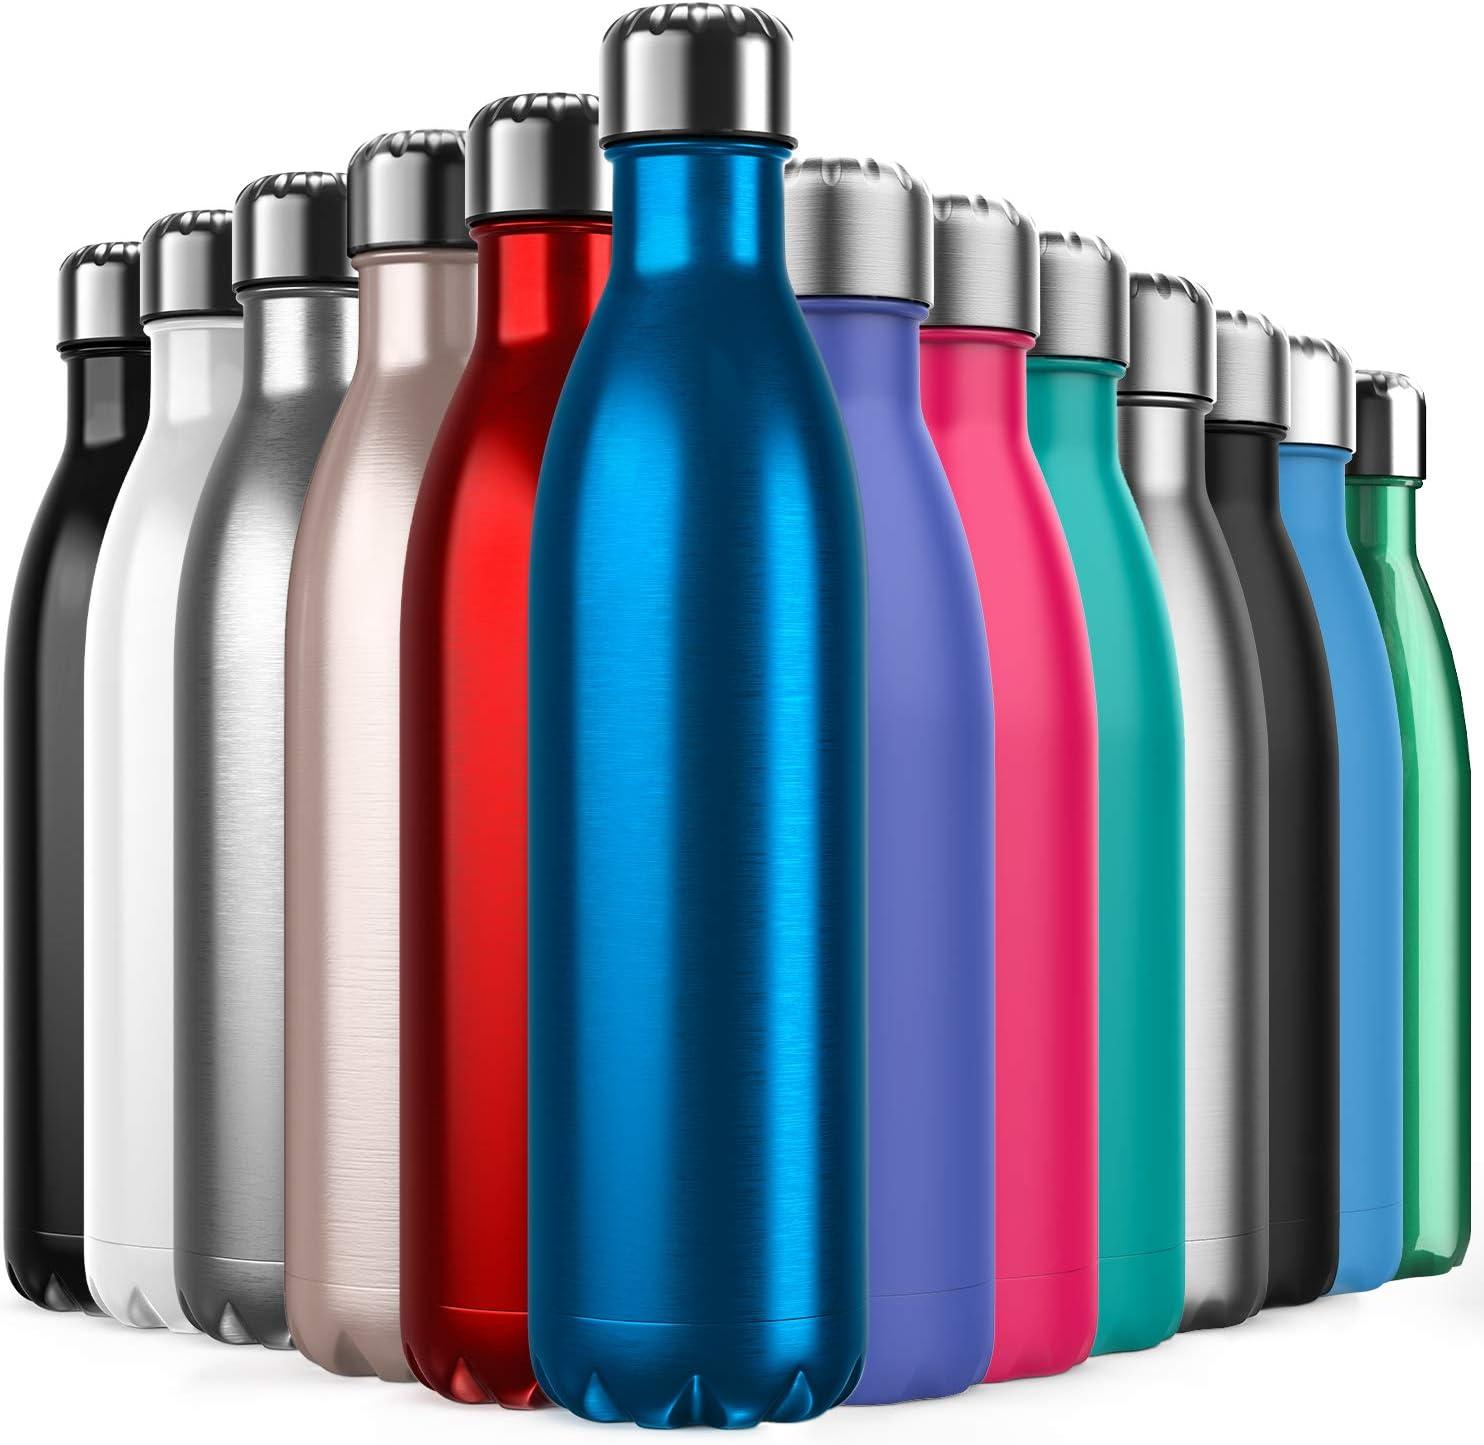 Invool Botella de Agua de Acero Inoxidable,Diseño de Pared Doble,Boca EstáNdar,para Correr,Gimnasio,Yoga,Ciclismo,750ML,Azul